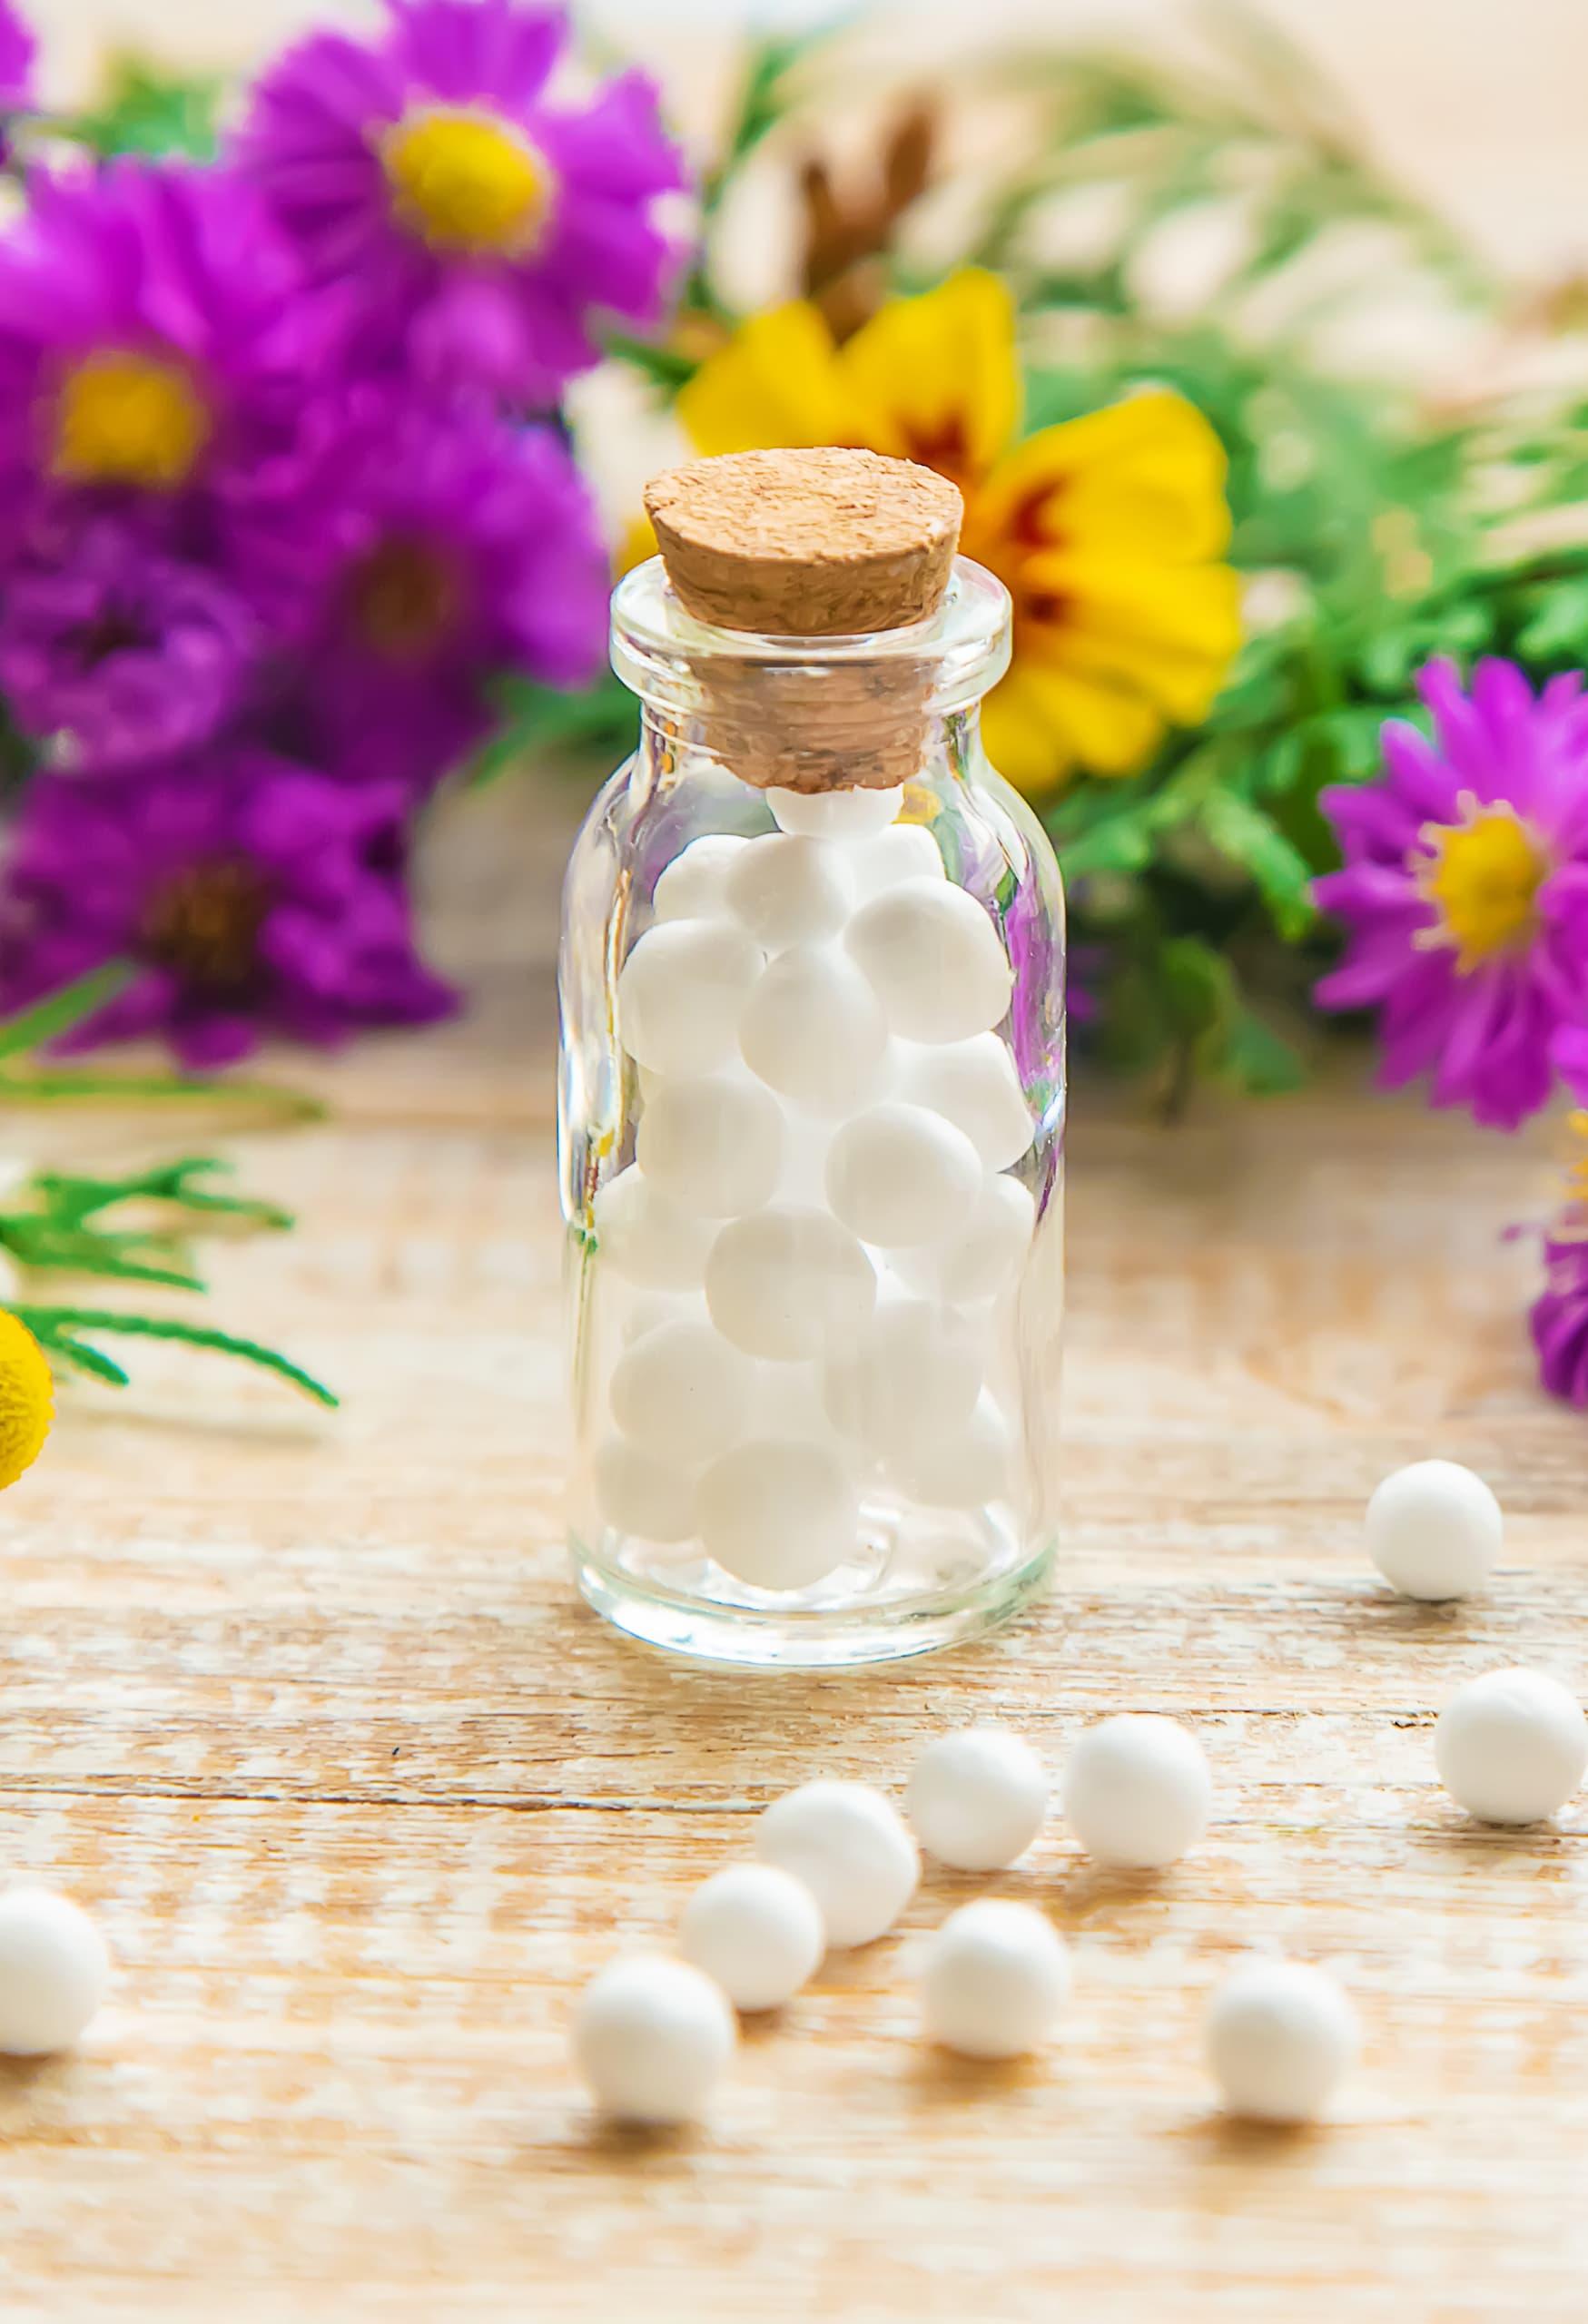 price-homeopathy-dublin-15-kateryna